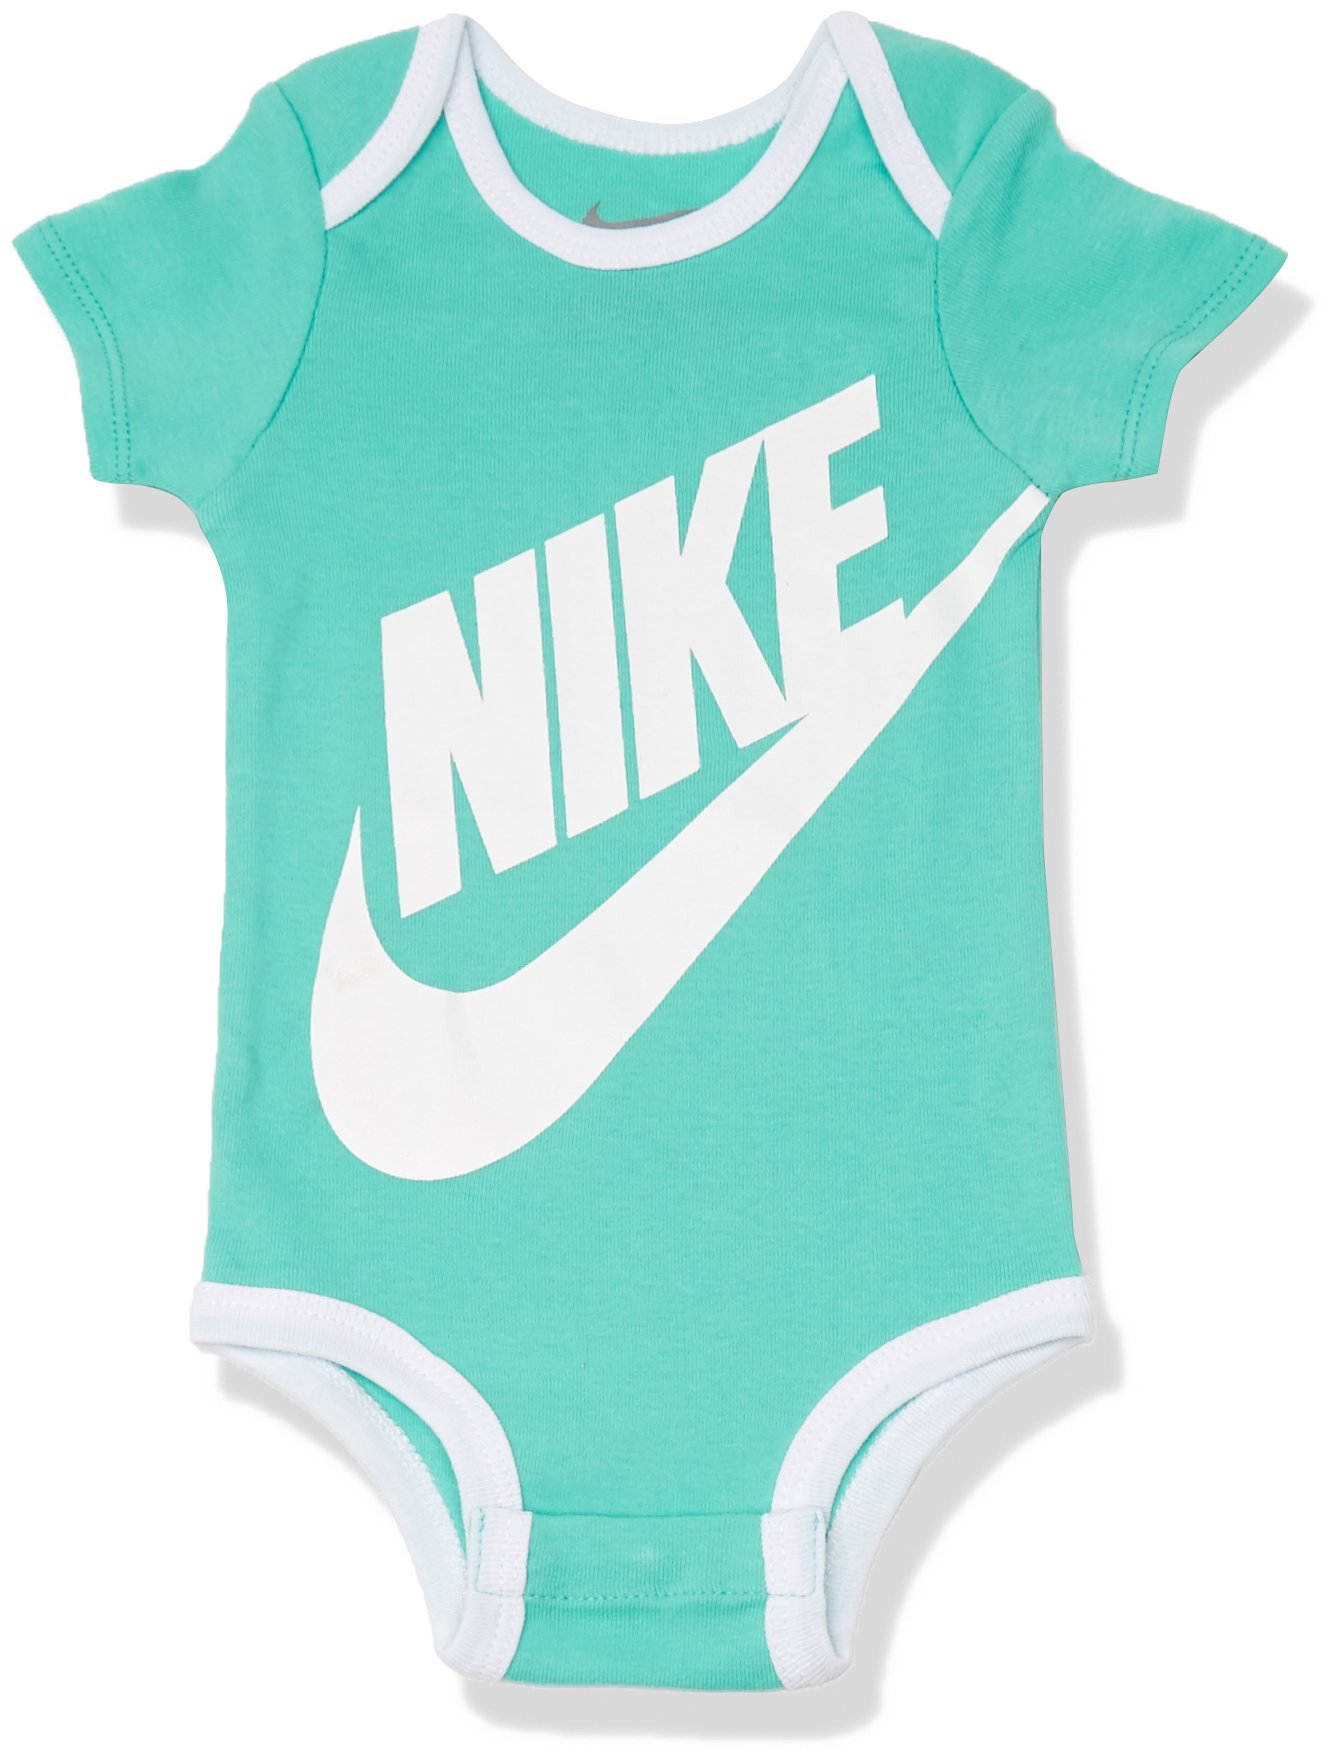 NIKE – Body – para bebé niña Turquesa Turchese (Hyper Turquoise) One Size (Taglia Produttore:Taglia Unica)